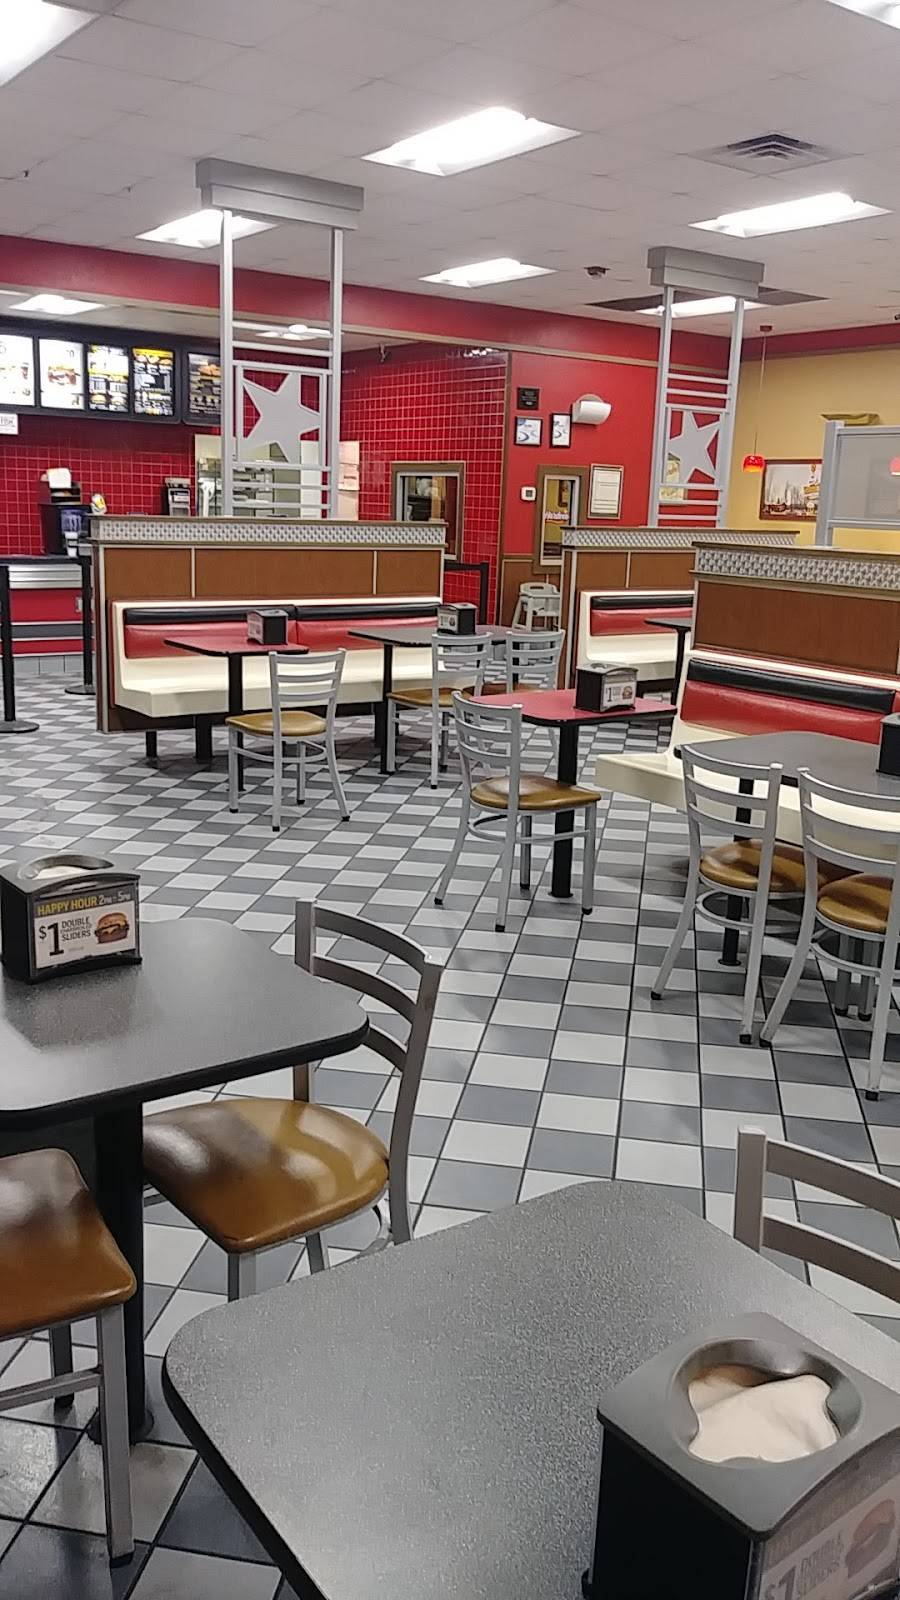 Hardees | restaurant | 2203 N Main St, Summerville, SC 29483, USA | 8438732626 OR +1 843-873-2626